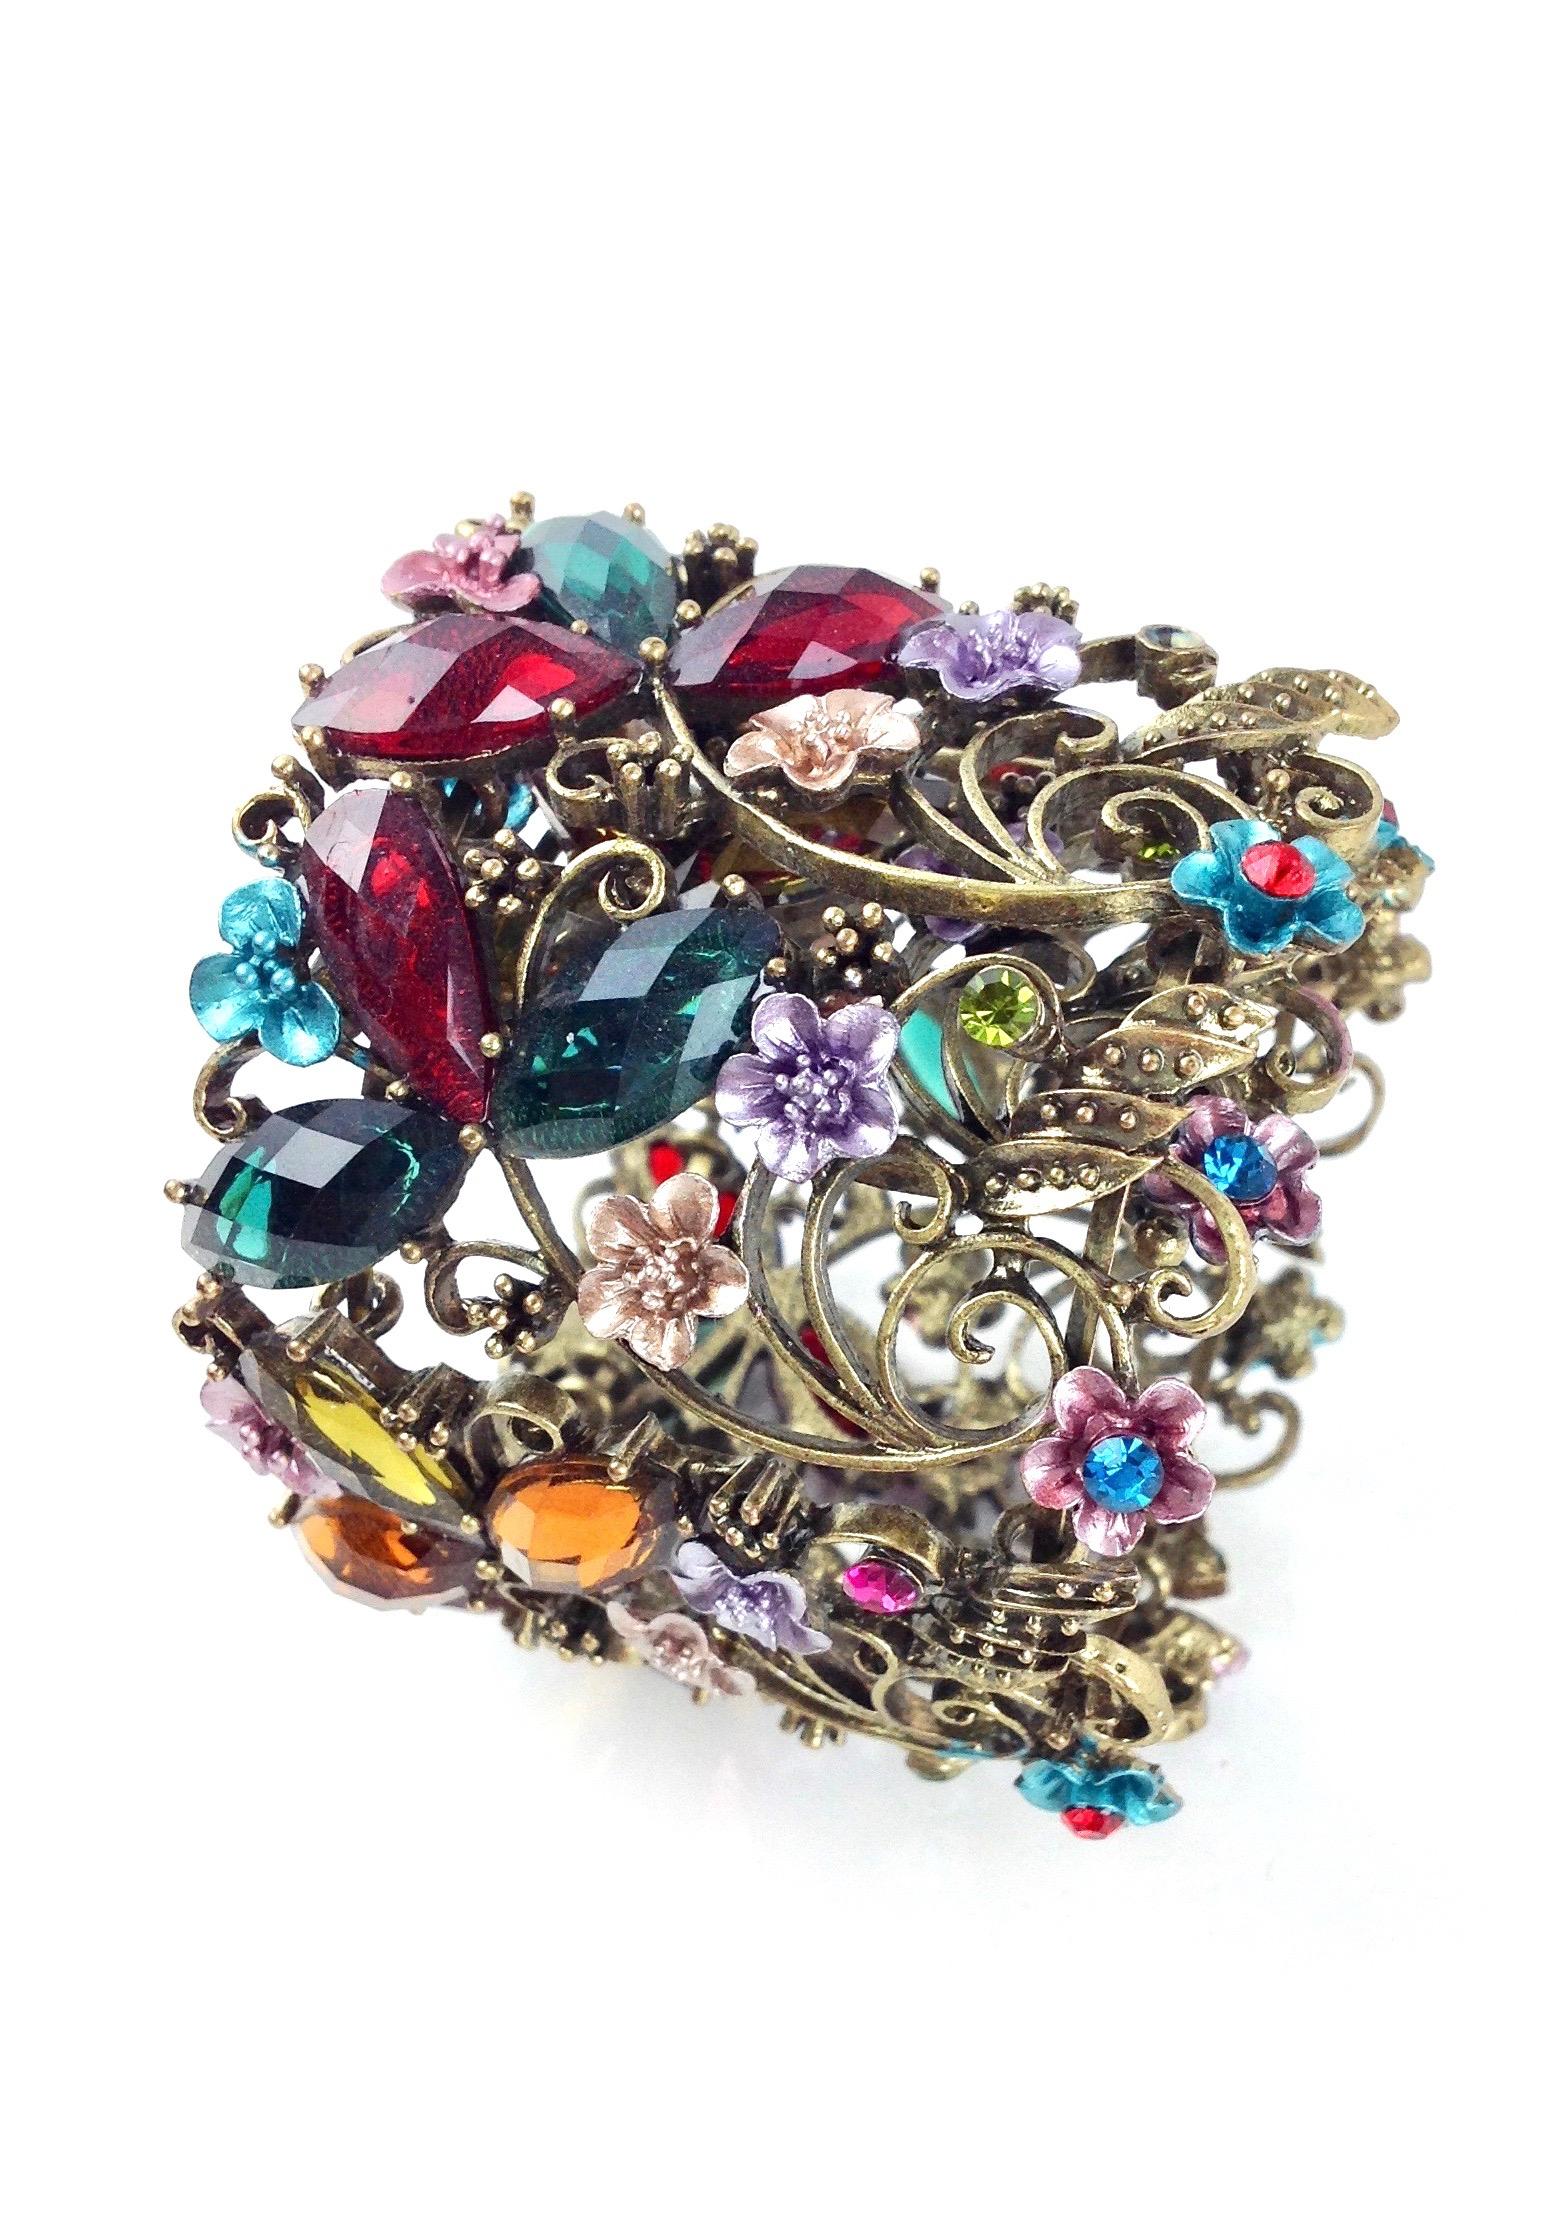 Crystal filigree cuff bracelet go home modern decor for Modern home decor gifts